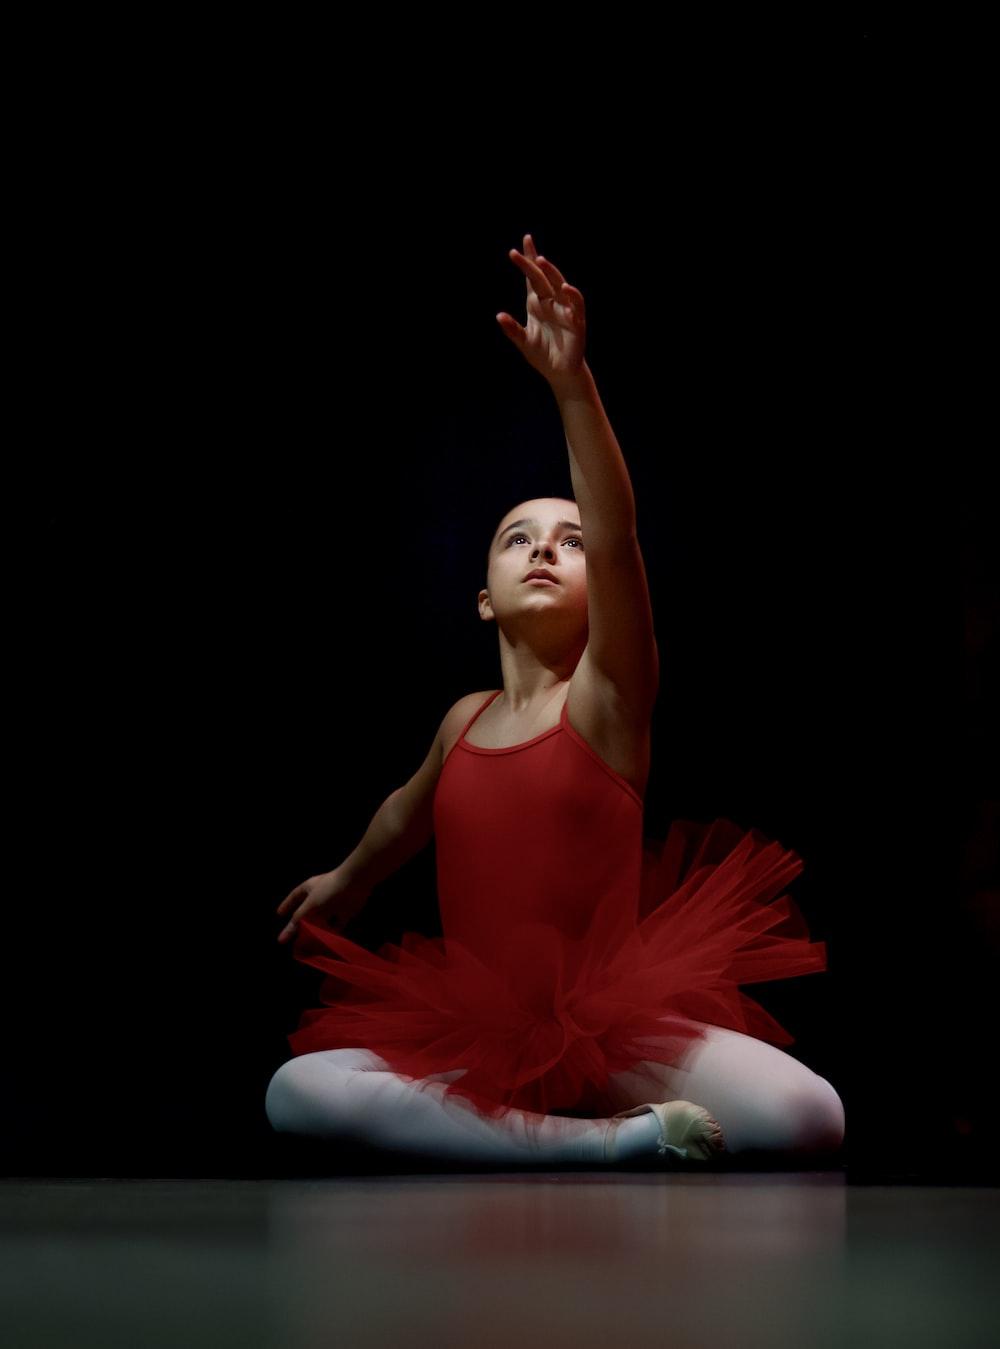 ballerina in red dress